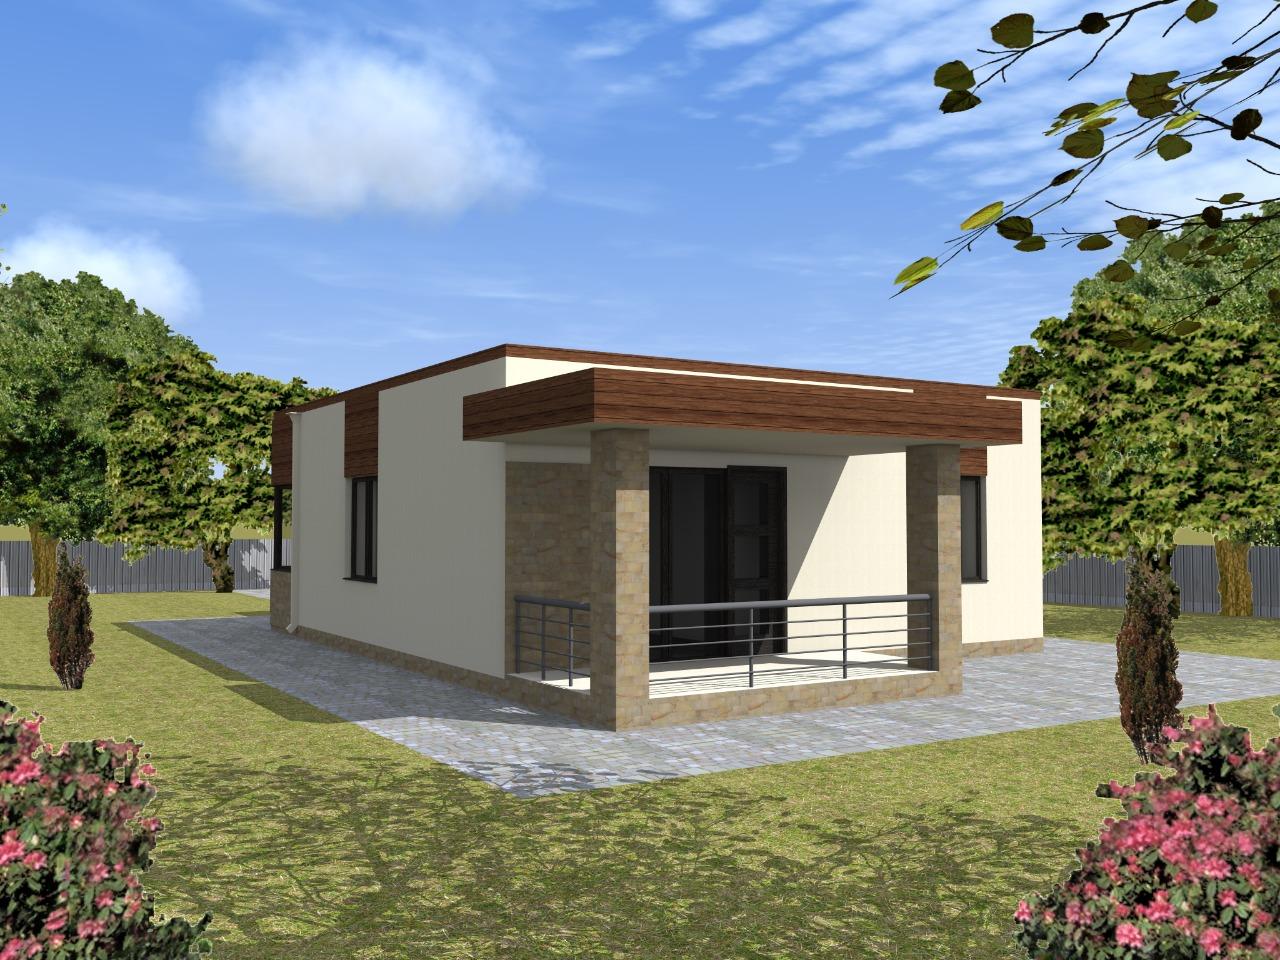 Проект одноэтажного дома из кирпича 9 на 10